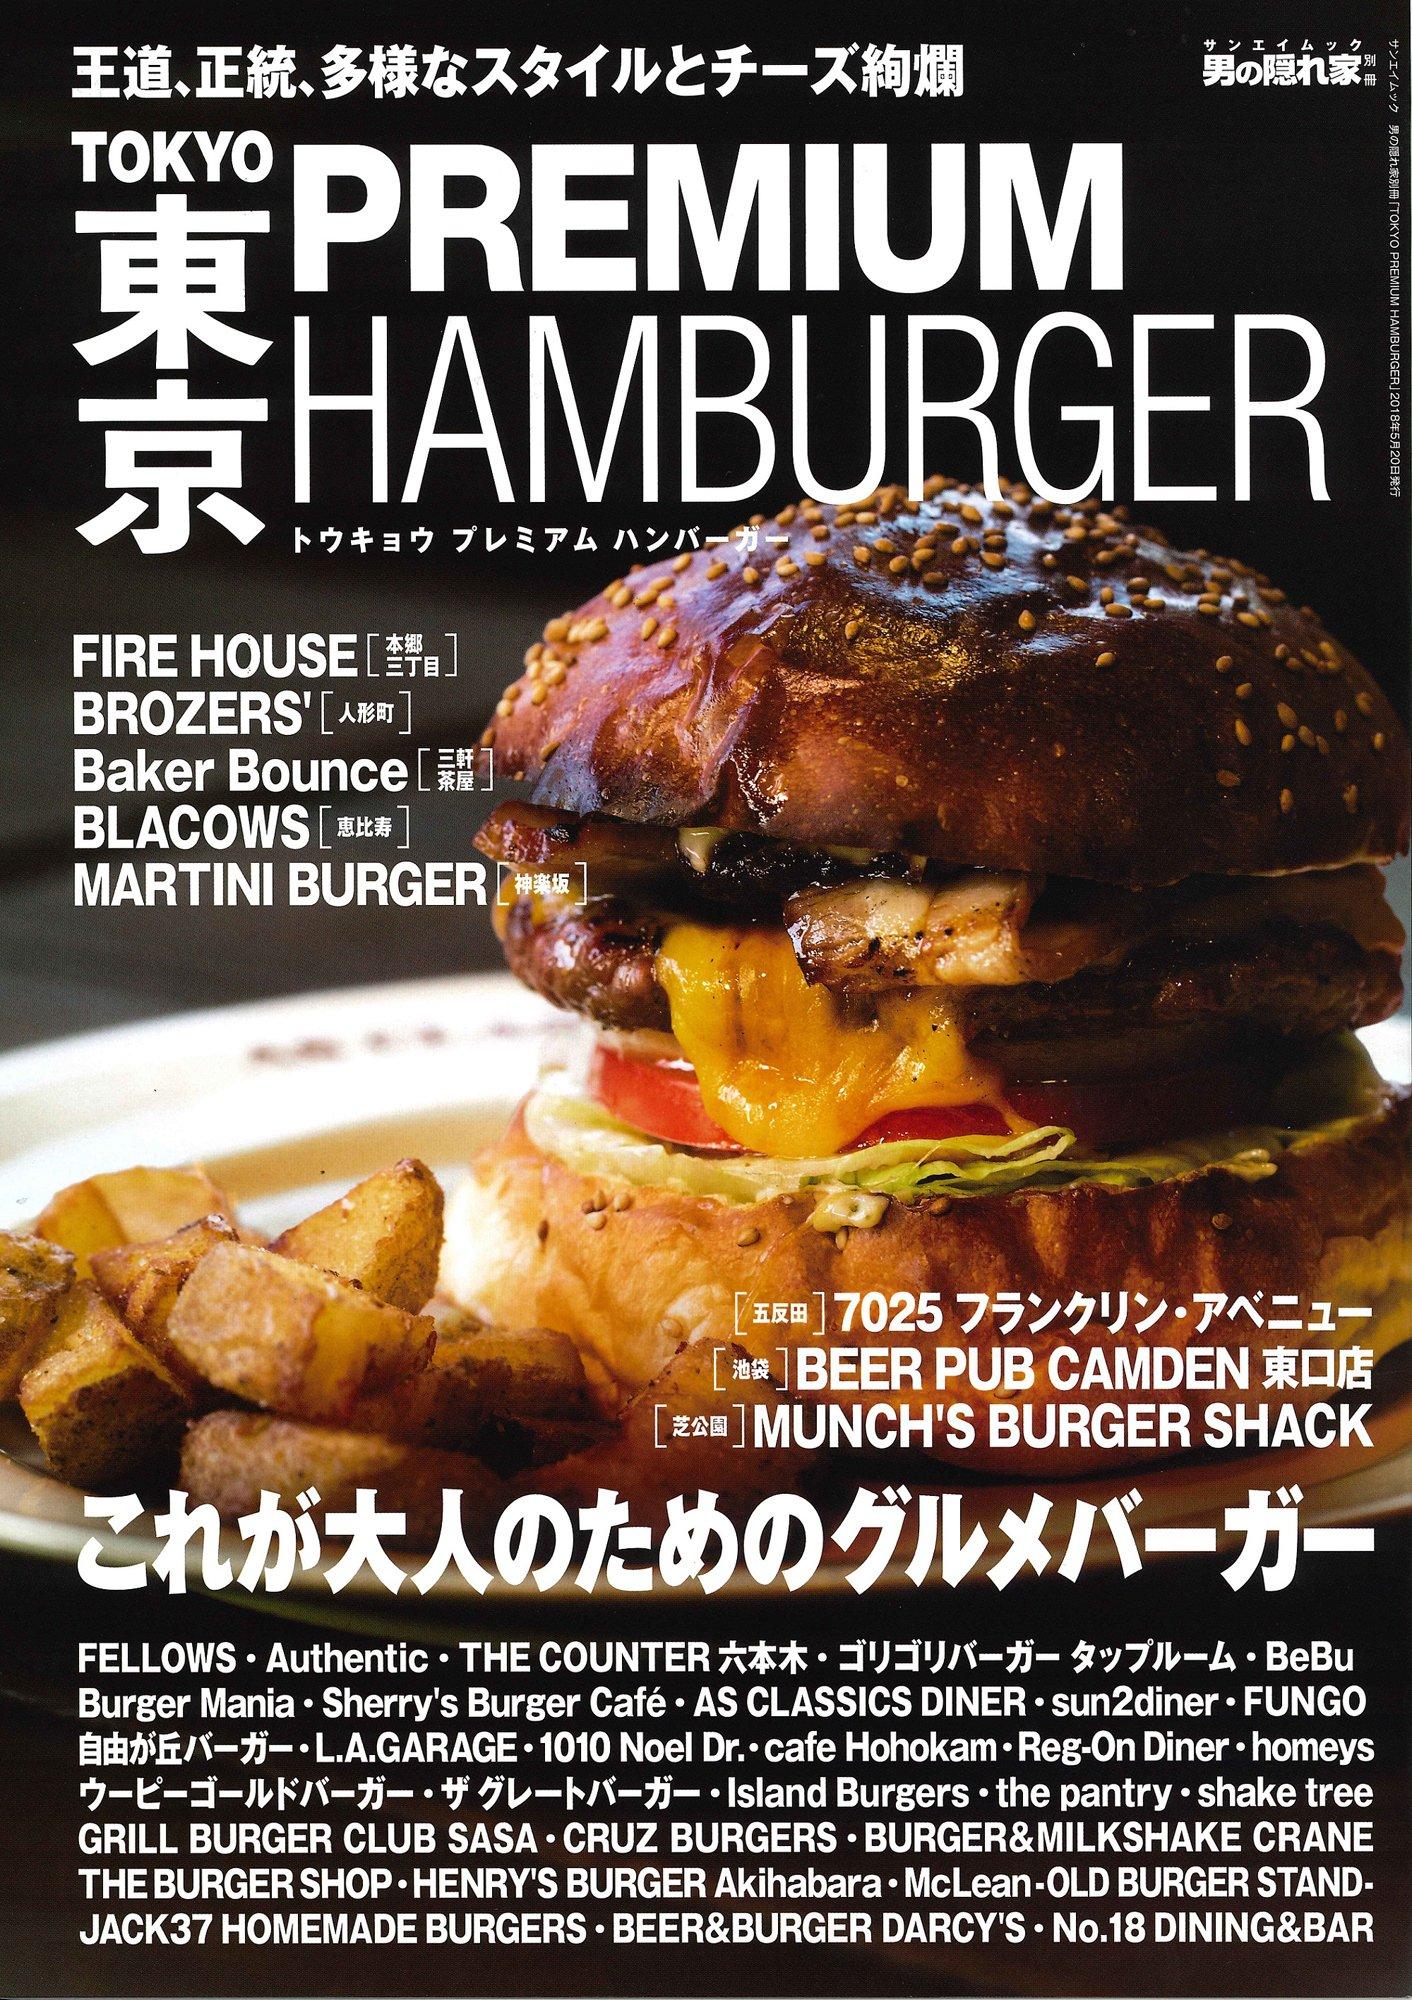 TOKYO PREMIUM HAMBURGER